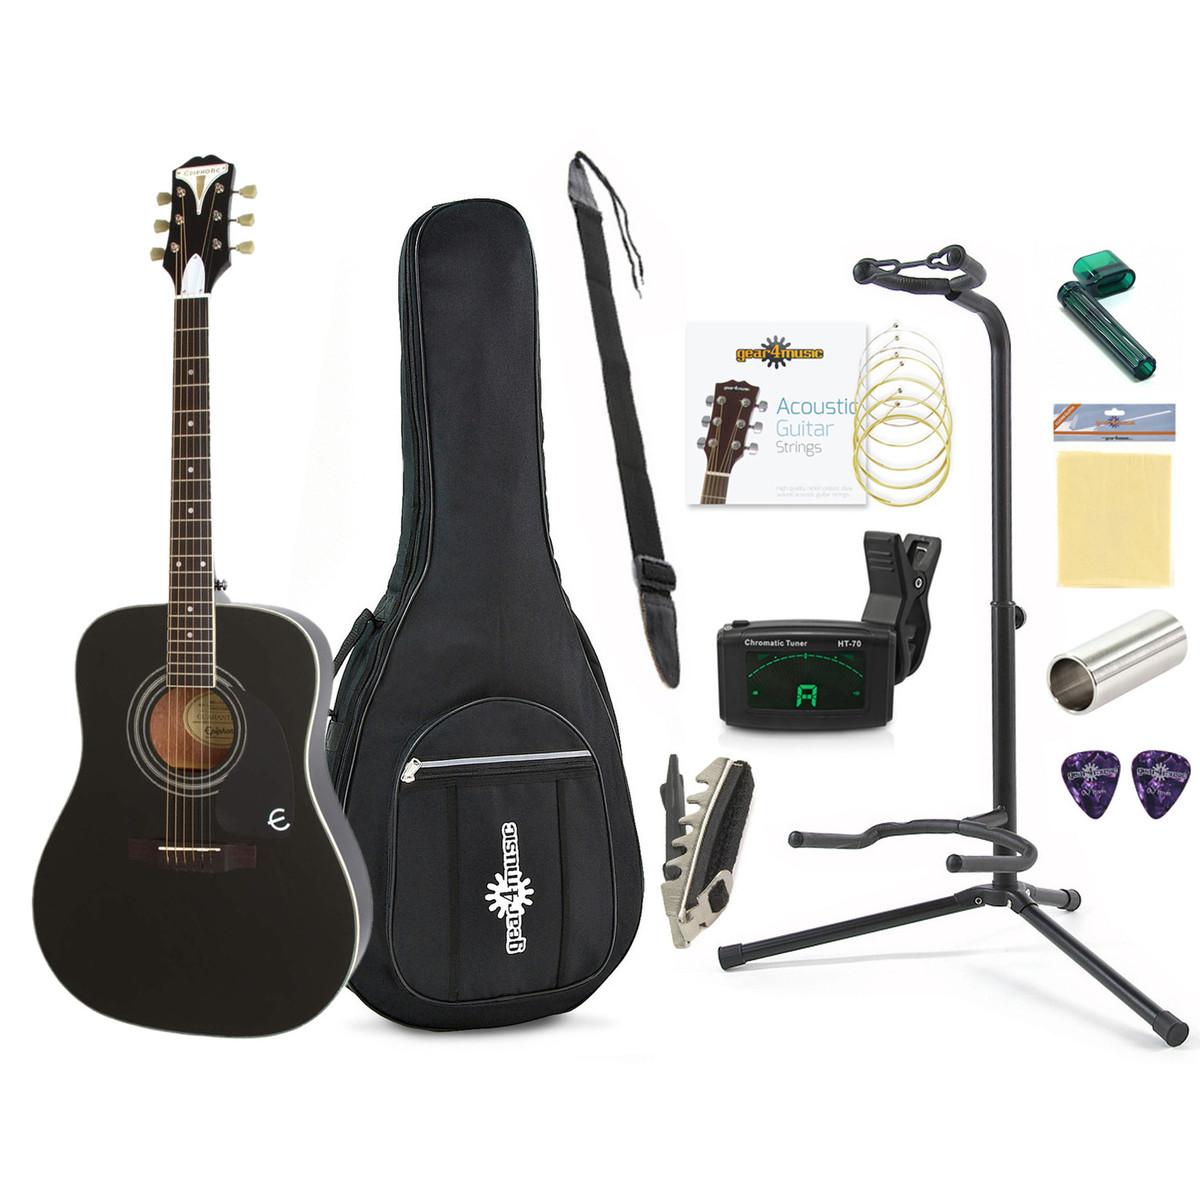 Disc Epiphone Pro 1 Plus Beginners Guitar Pack Black At